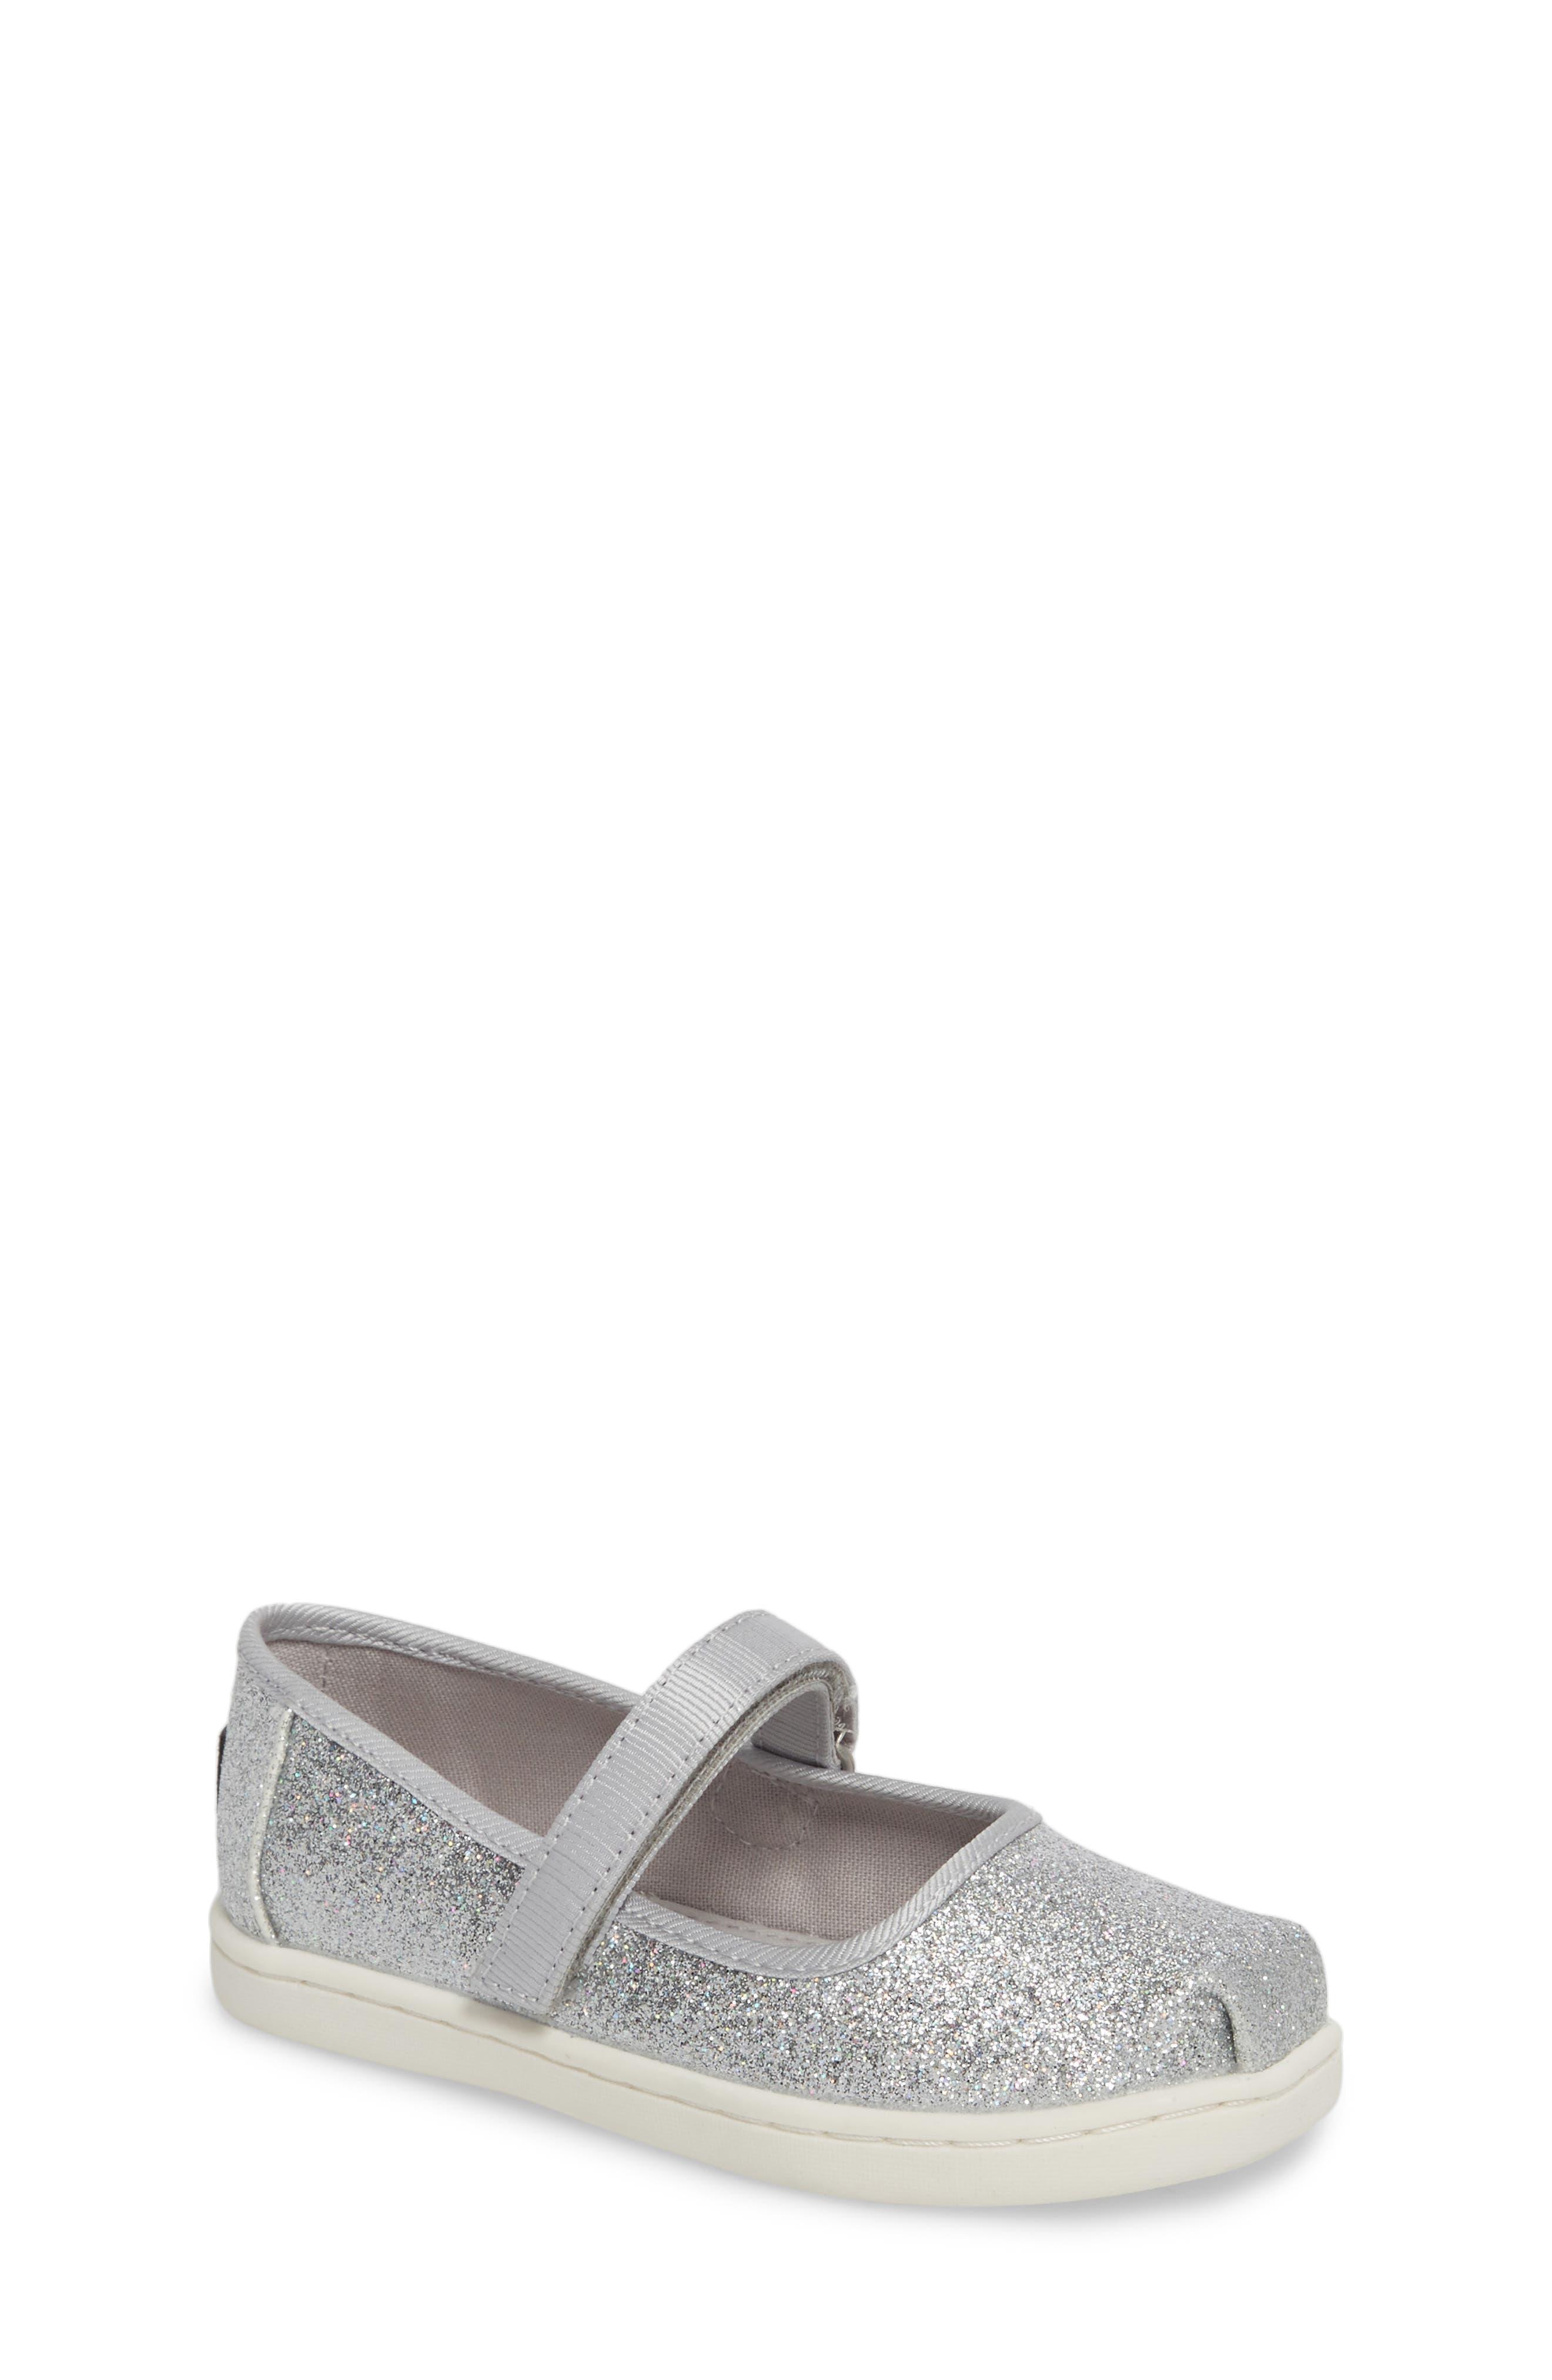 Infant Girls Toms Mary Jane Sneaker Size 4 M  Metallic